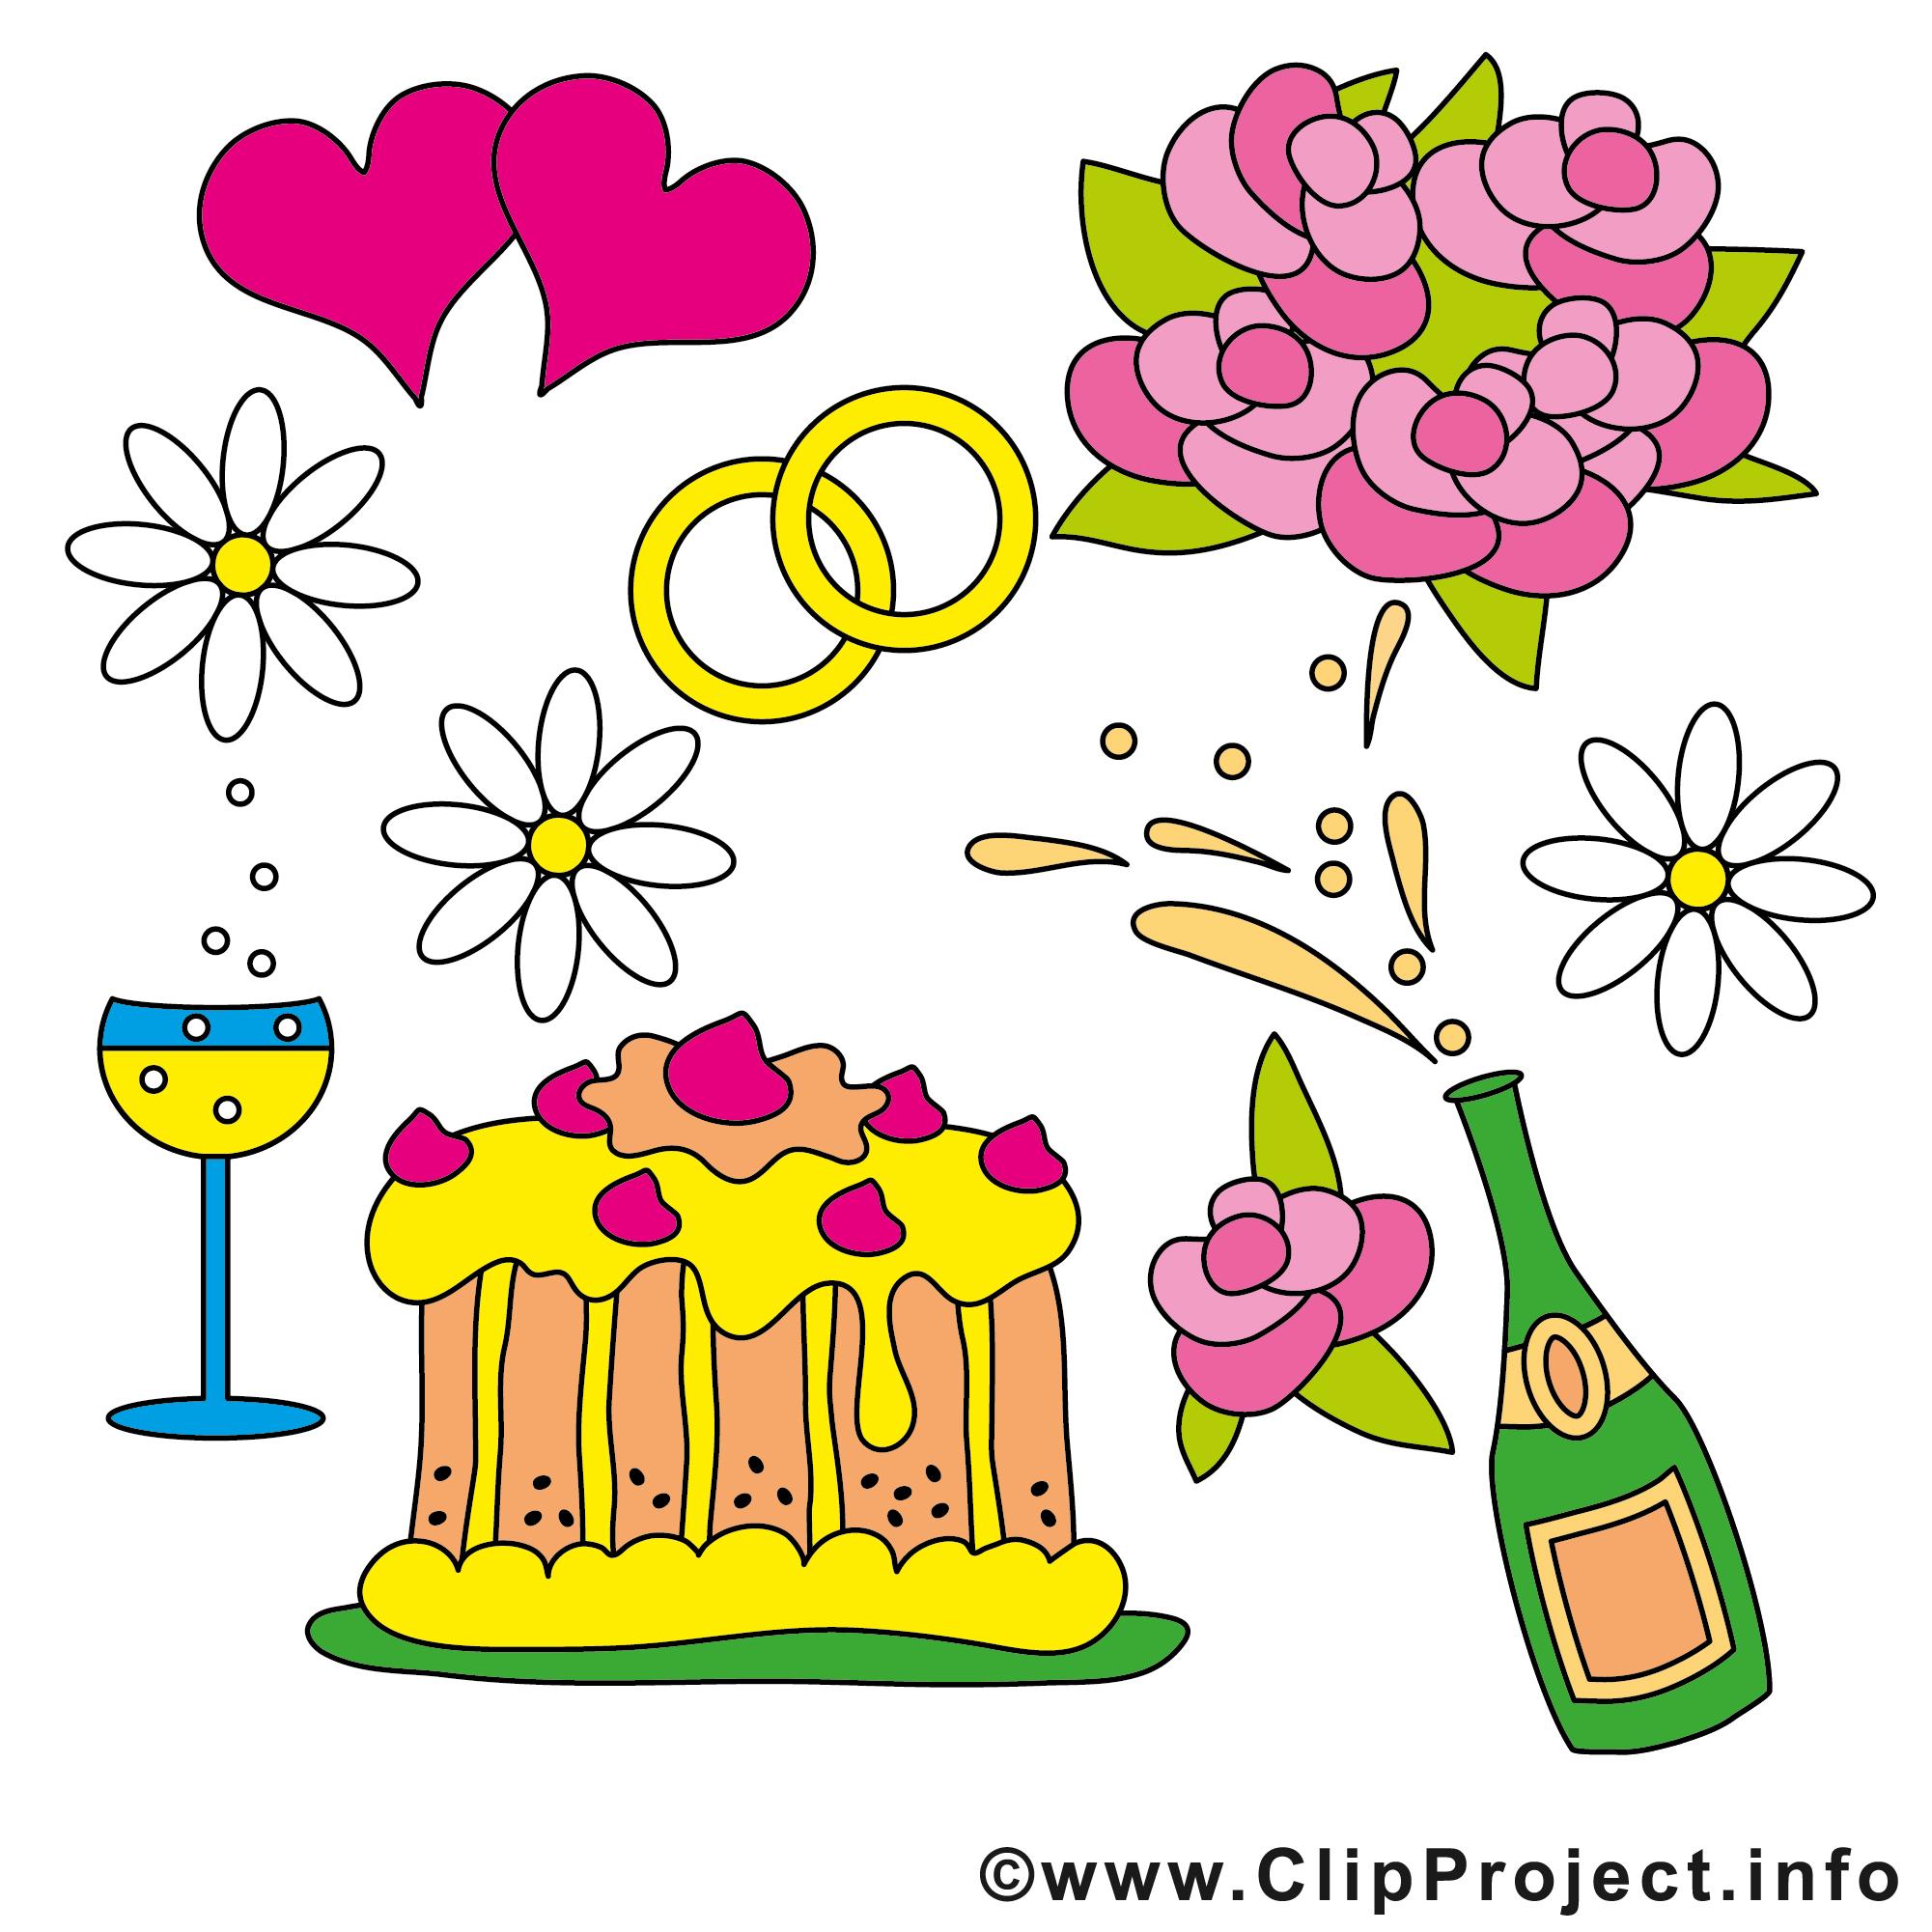 Gratis clipart bilder clip royalty free Clipart Gratis & Gratis Clip Art Images - ClipartALL.com clip royalty free